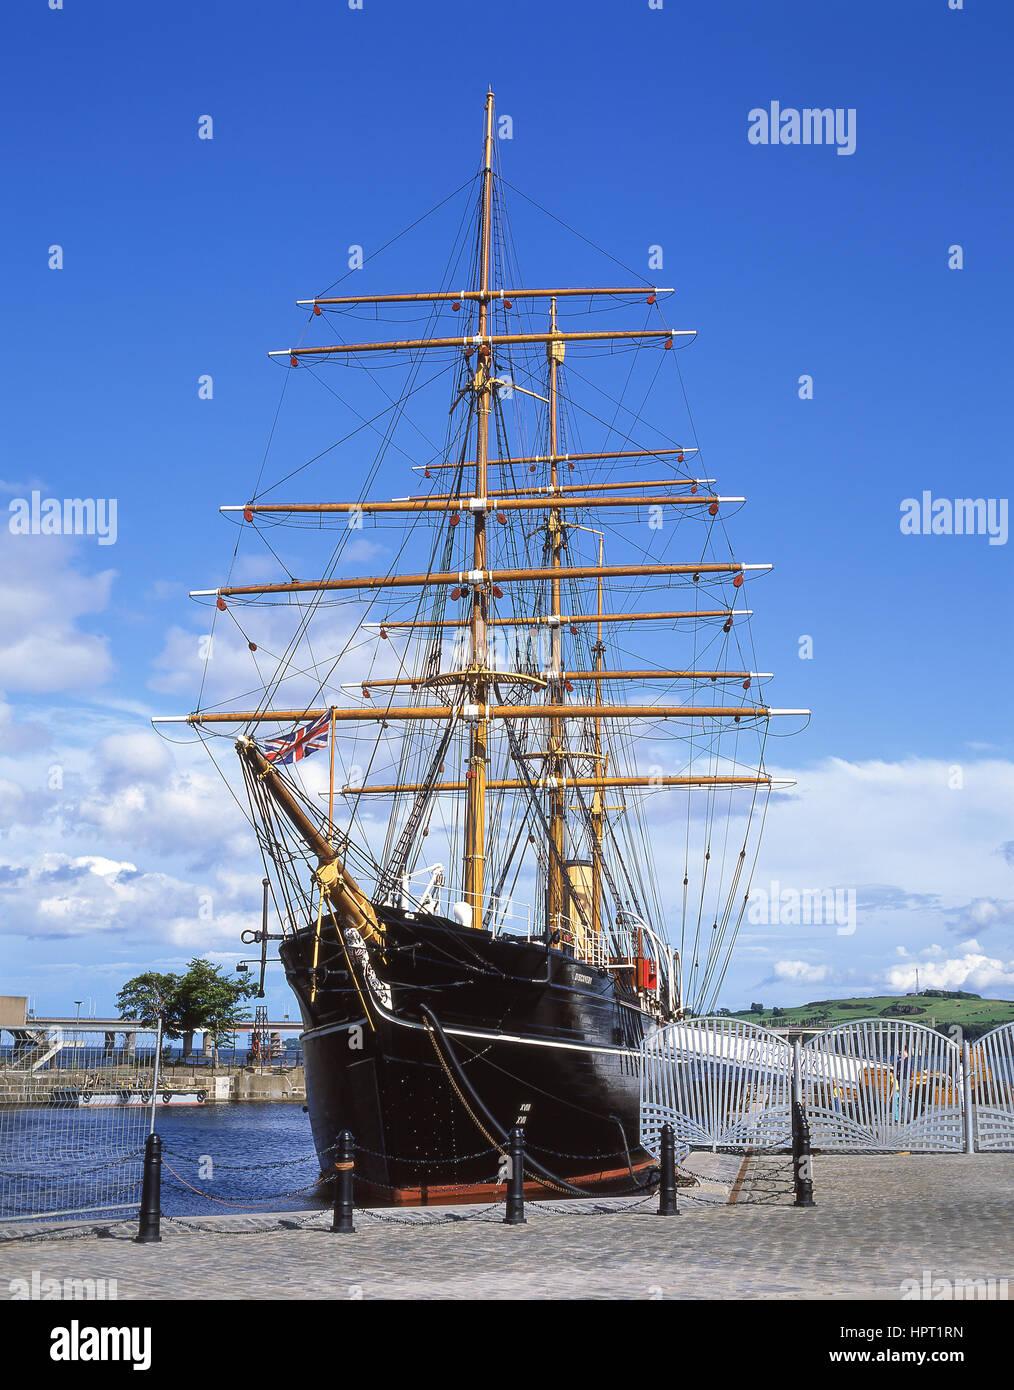 Captain Scott's HMS Discovery ship, Victoria Dock, Dundee, Dundee City, Scotland, United Kingdom - Stock Image